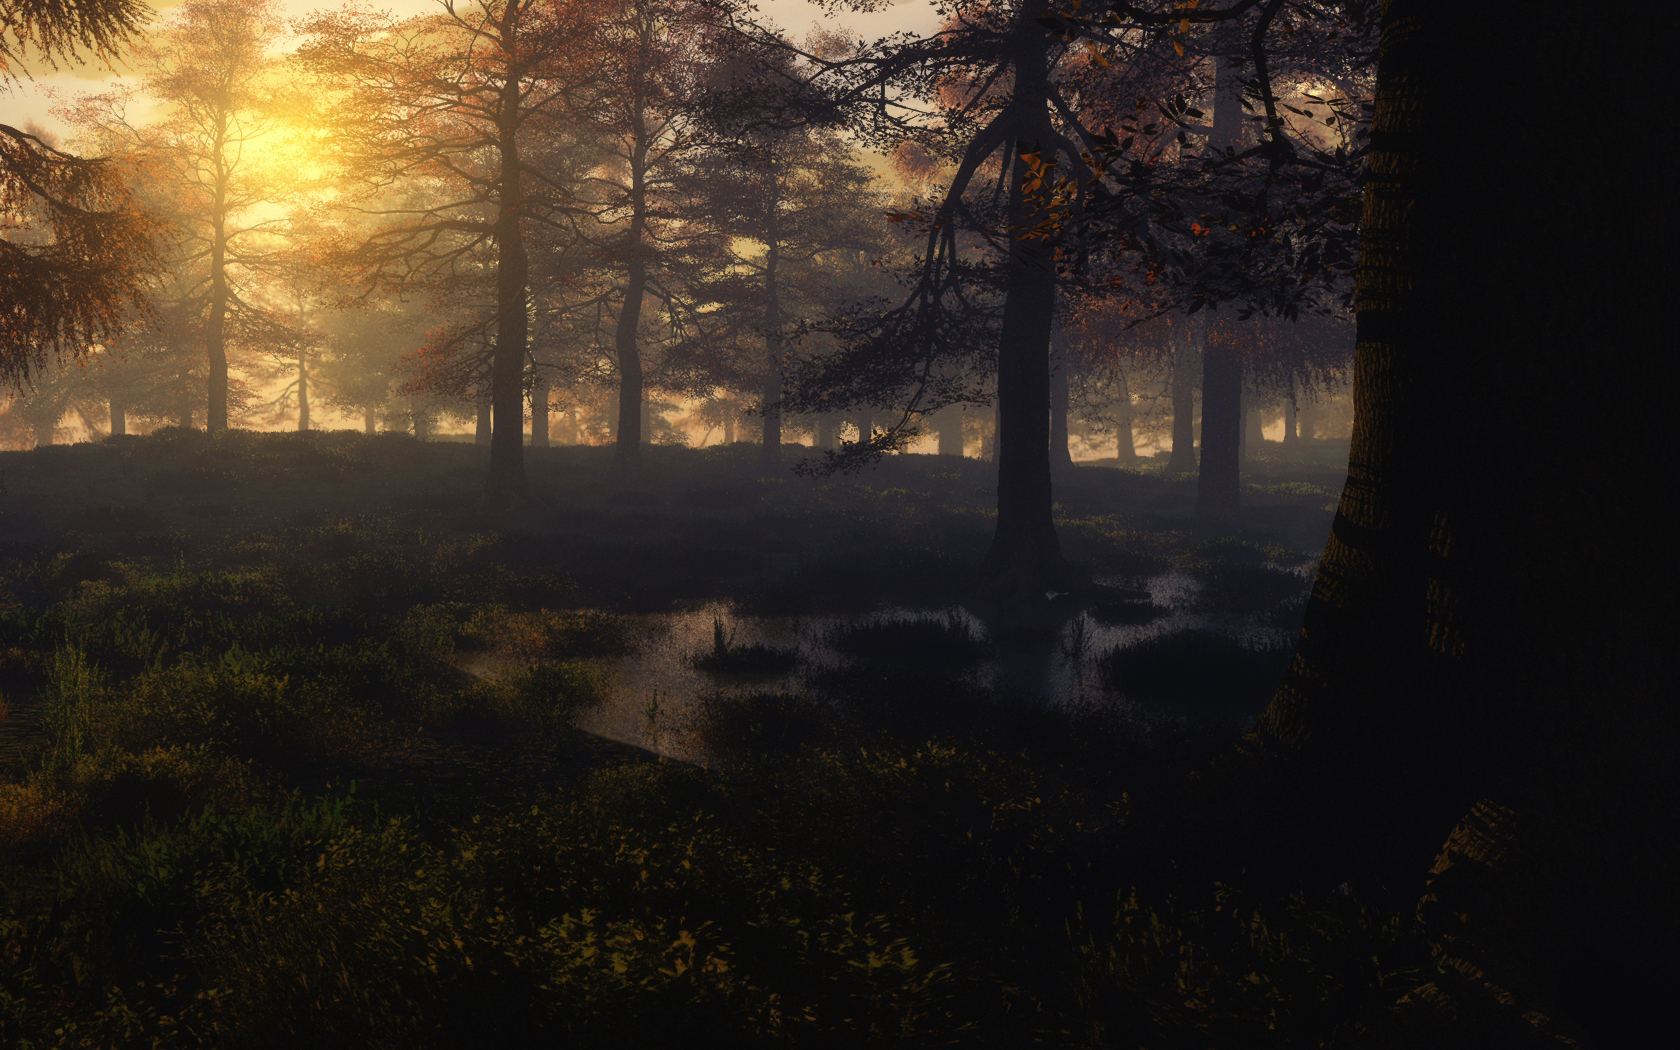 Autumn Mist by mayaslash